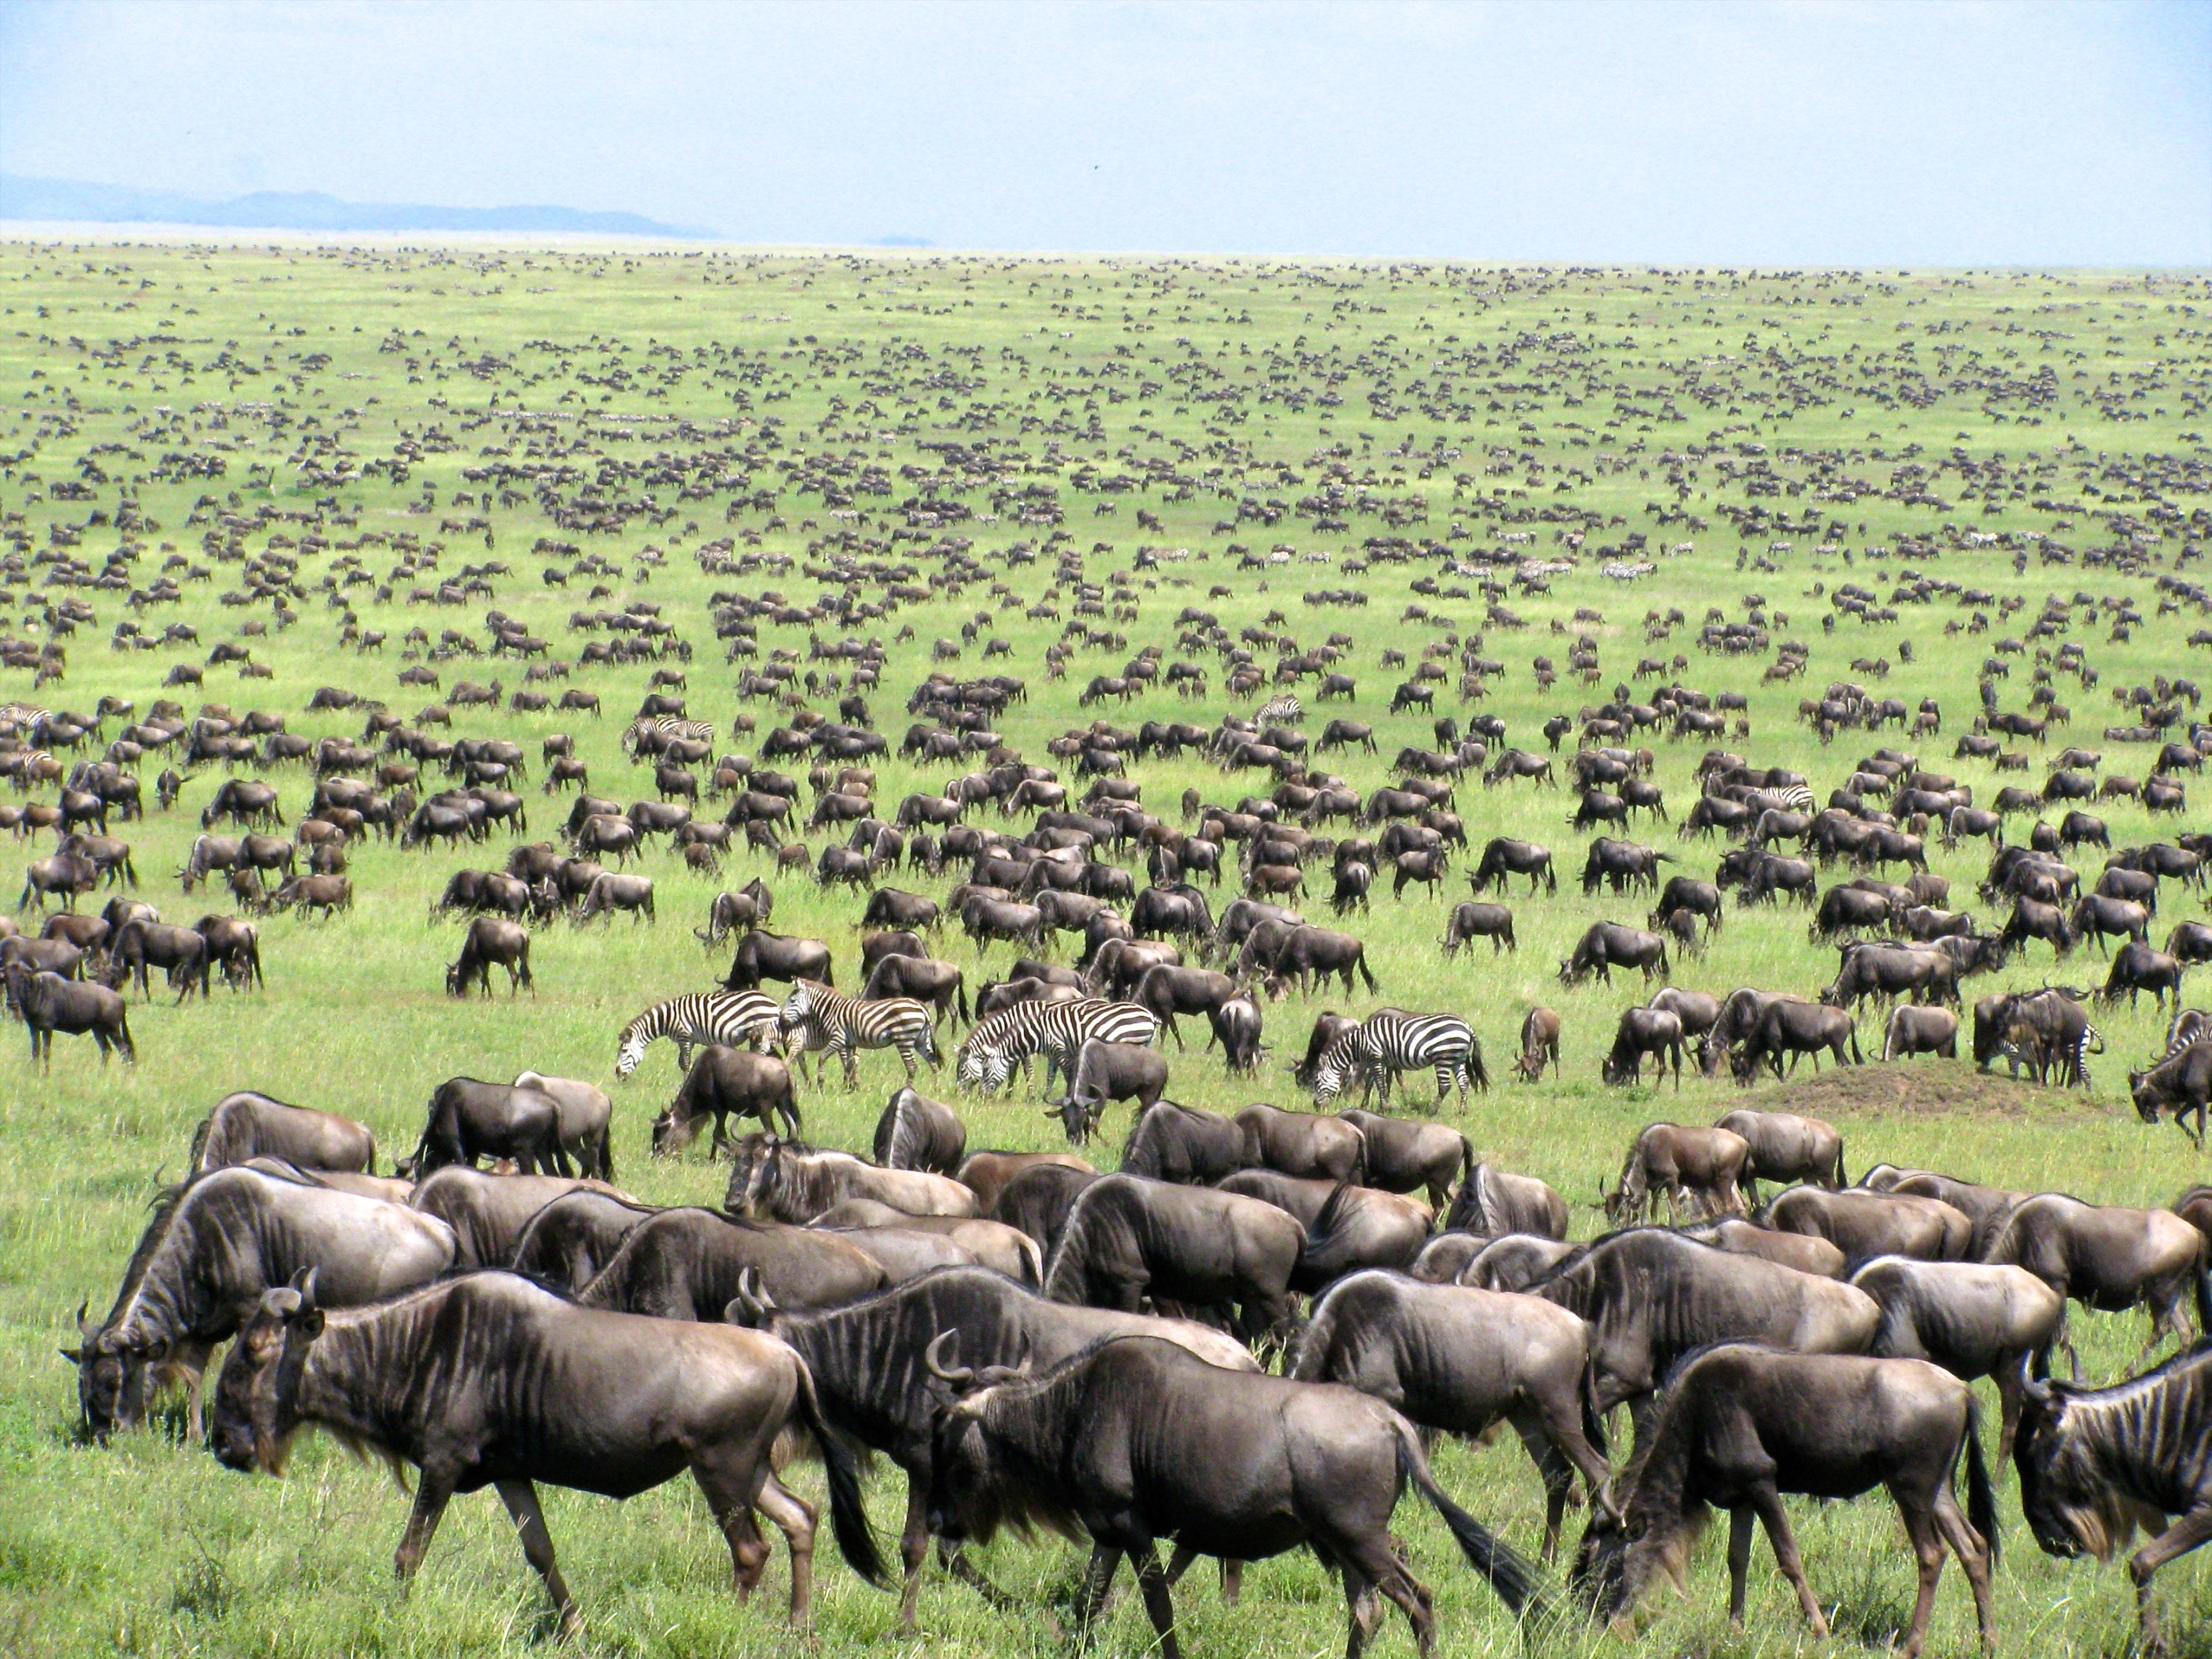 Wildbeest & Zebra Migration at Masai Mara